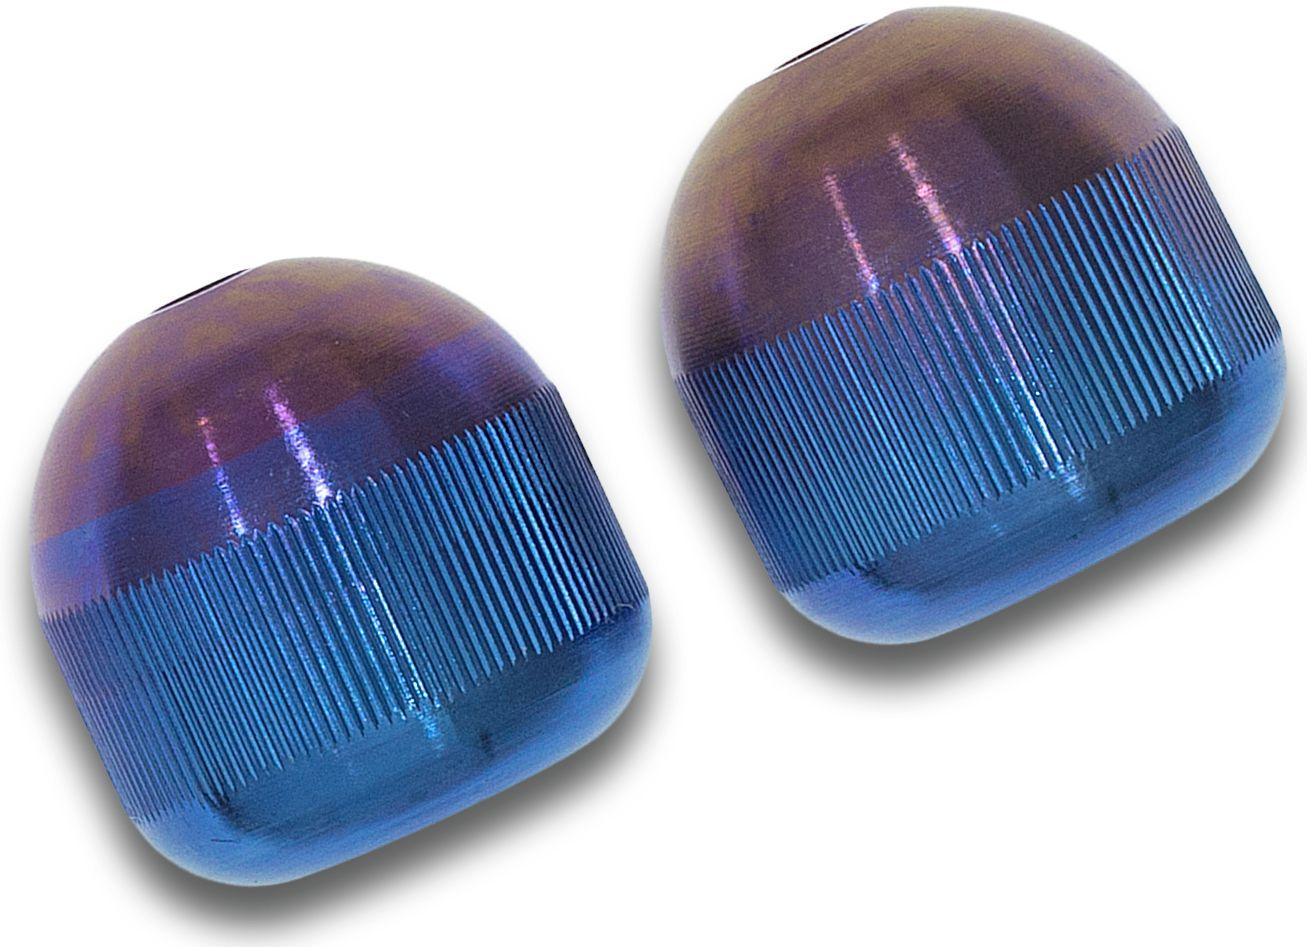 Aroundsquare AO2 Customized Titan Begleri, Purple to Blue Fade Grahamodized